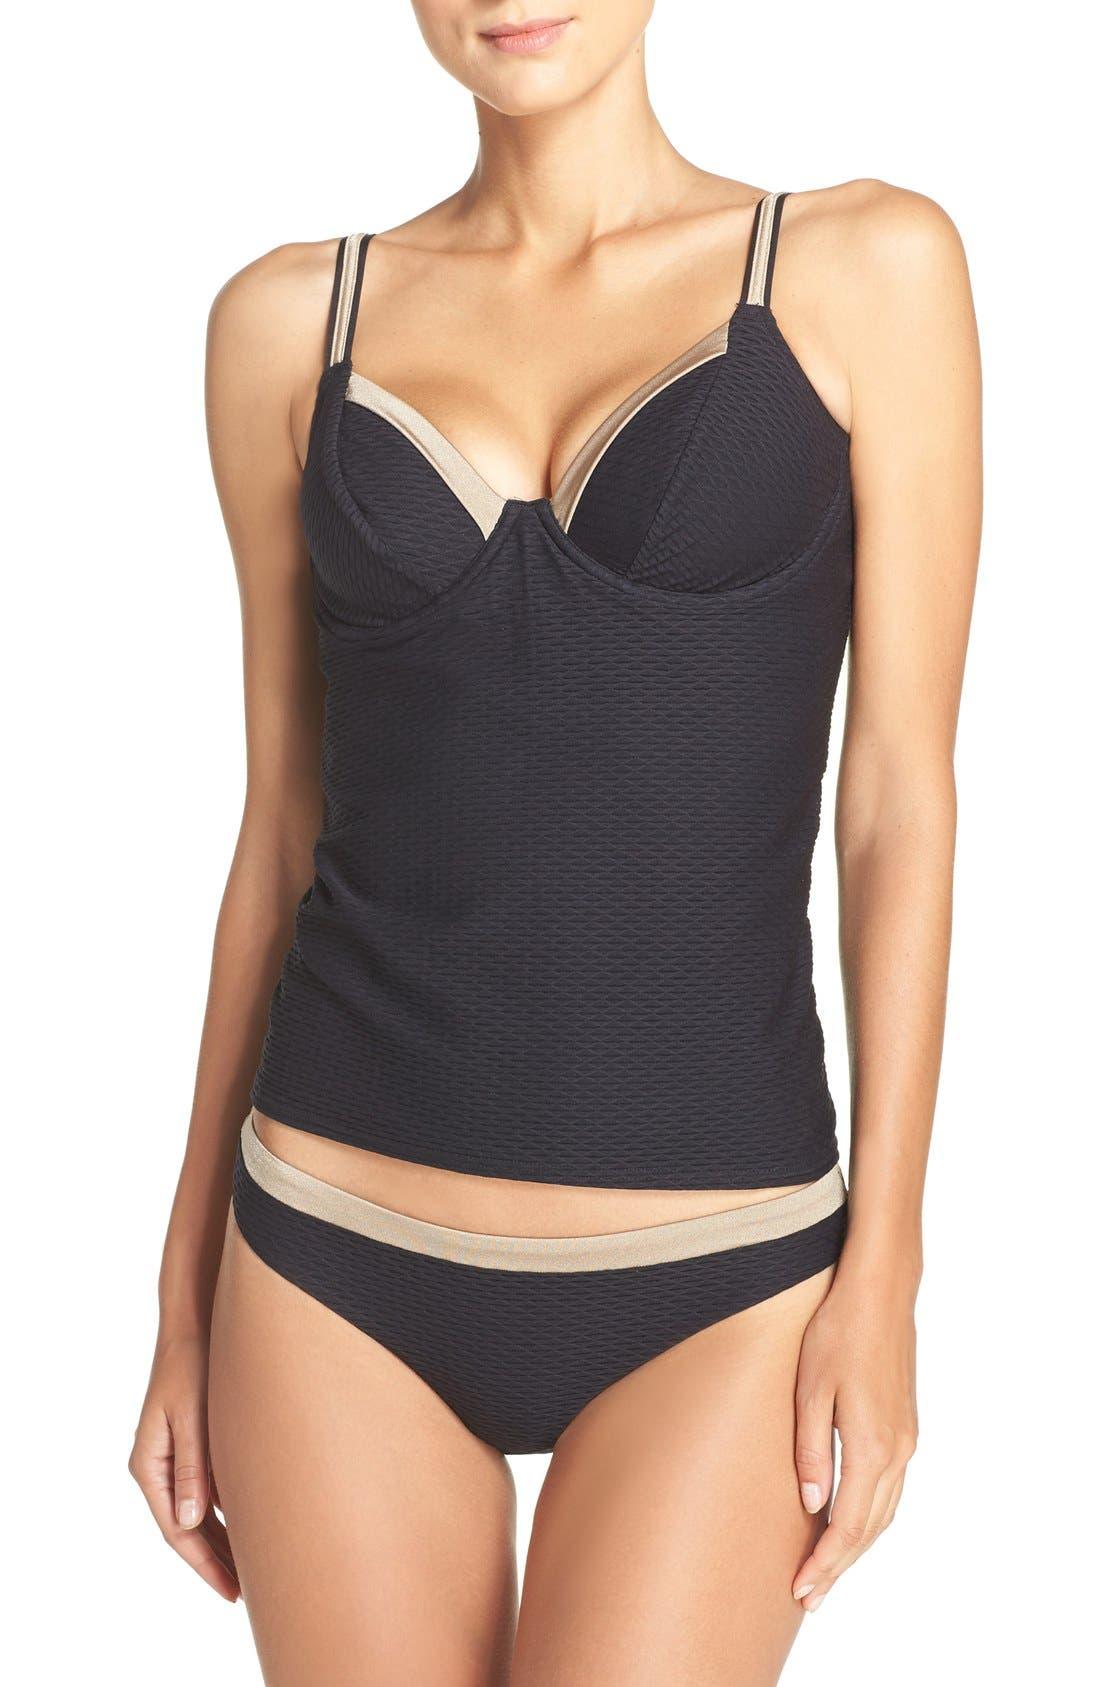 Fantasie Monaco Tankini Top & Bikini Bottoms